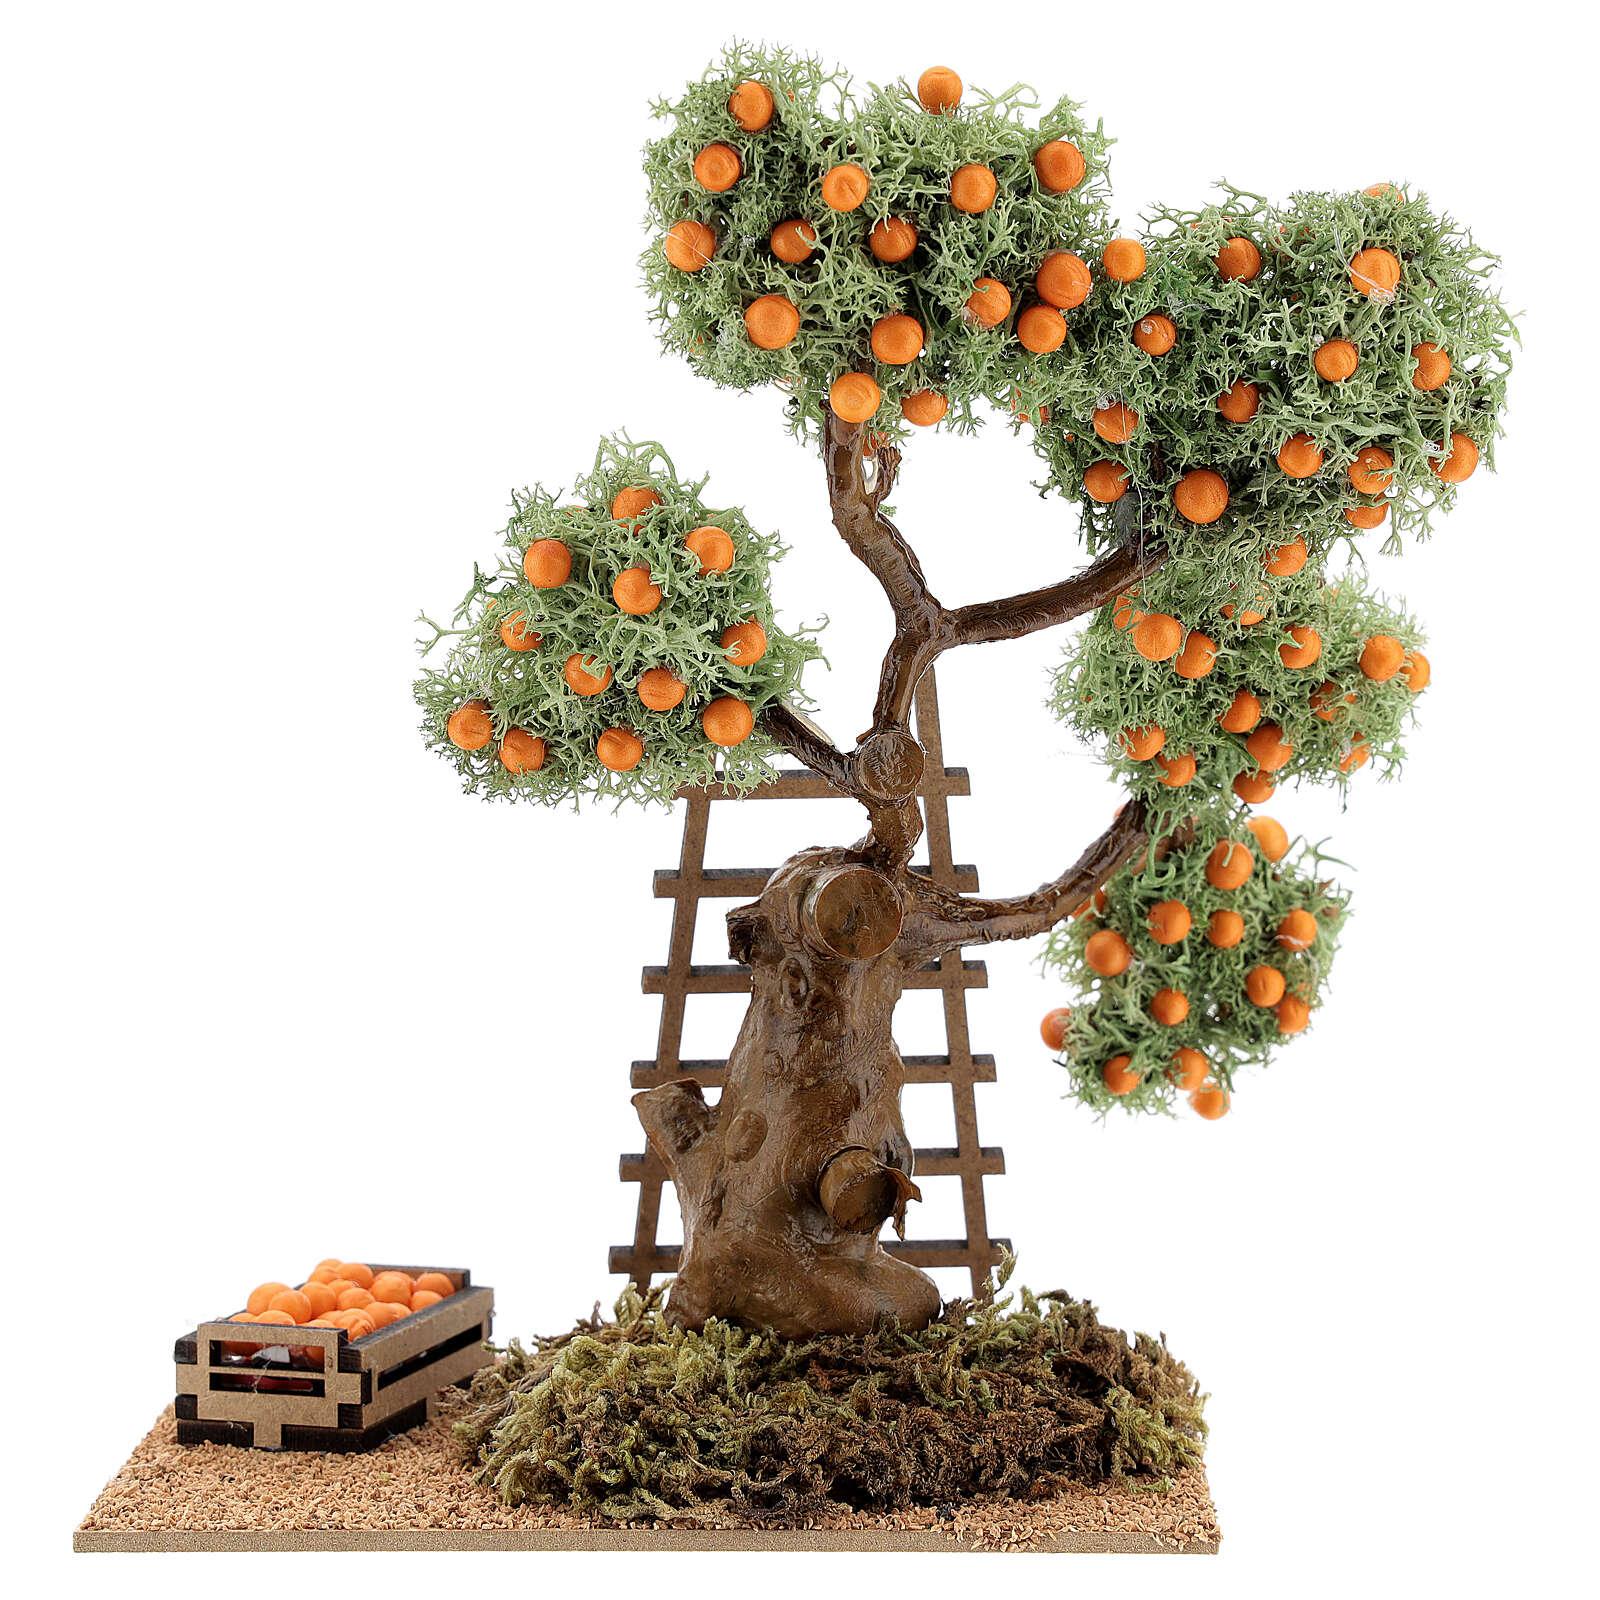 Orange tree with box 16 cm for Nativity Scene with 8-10 cm figurines 4